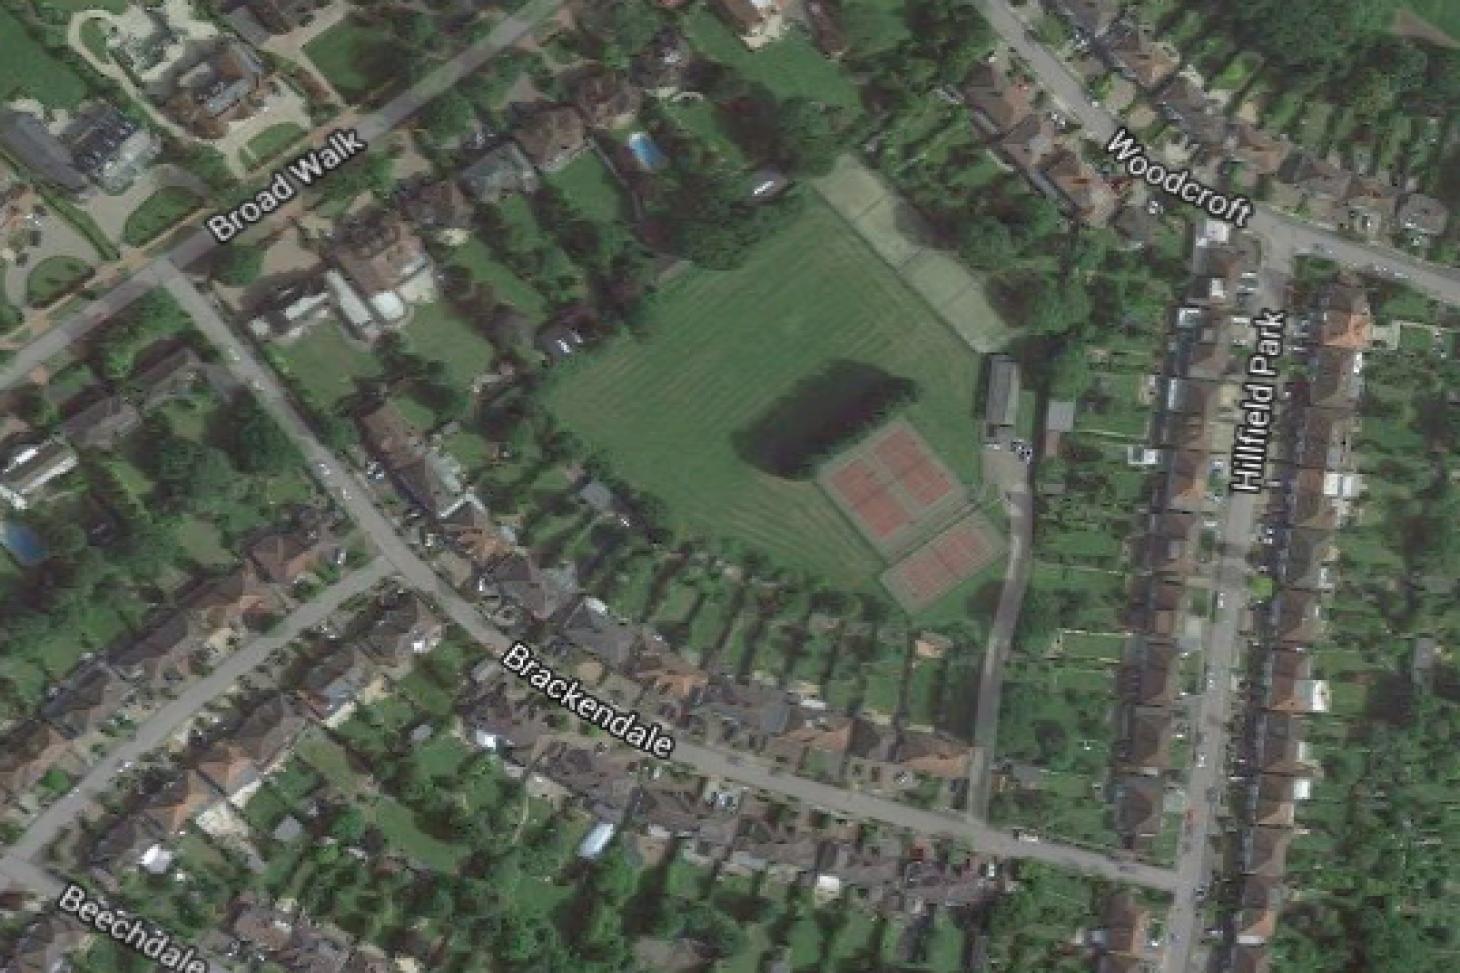 Brackendale Sports Ground 5 a side | Grass football pitch